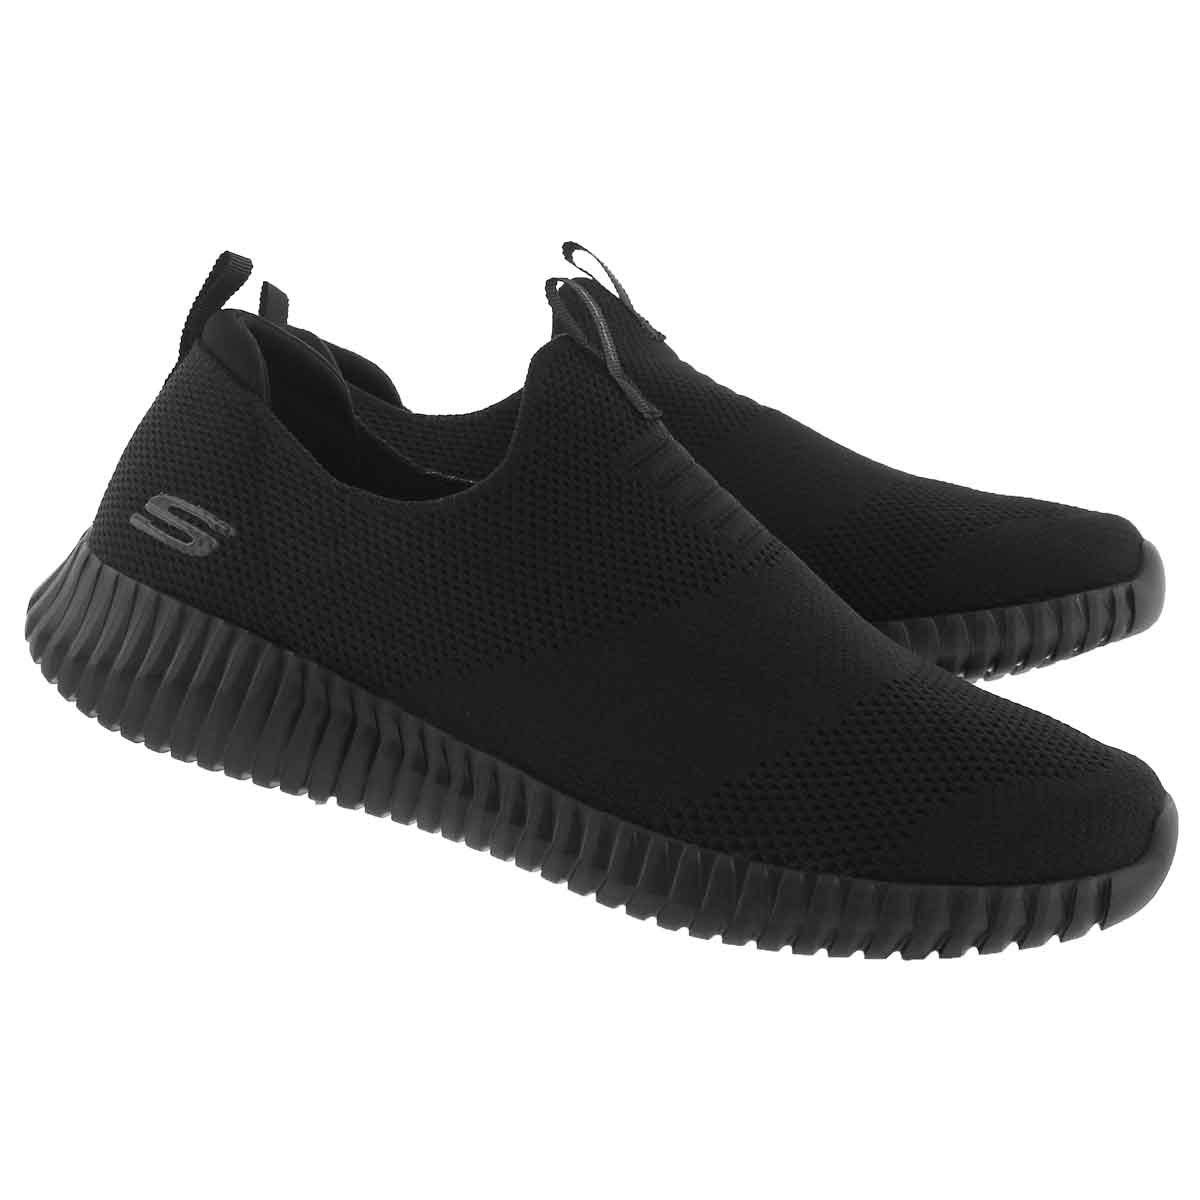 Mns Elite Flex Wasik black slip on shoe